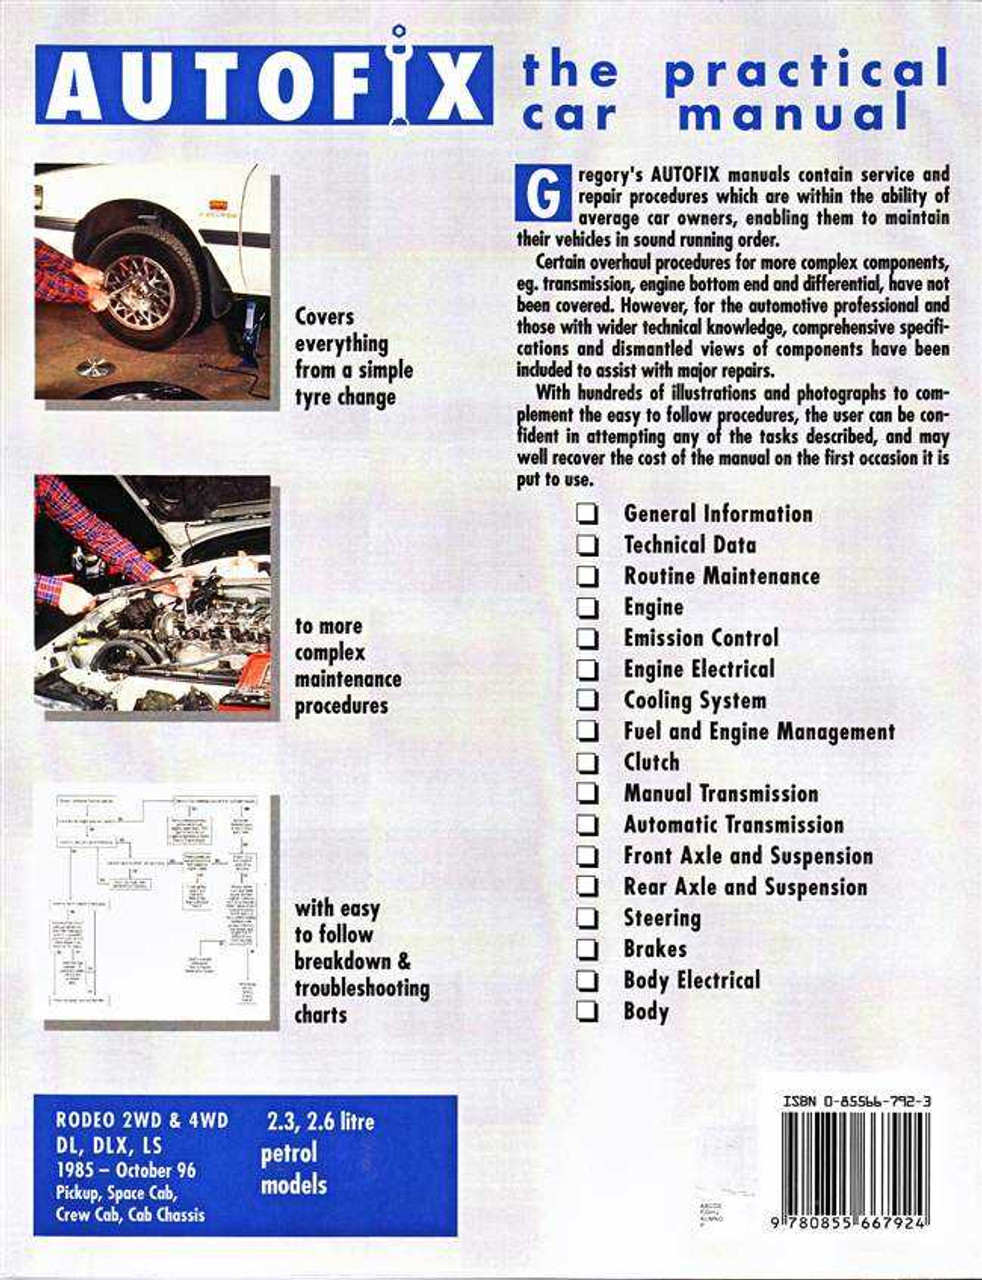 holden rodeo 2wd 4wd petrol 1985 1996 workshop manual rh automotobookshop com au vs Holden Colorado Rodeo 1997 Holden Rodeo